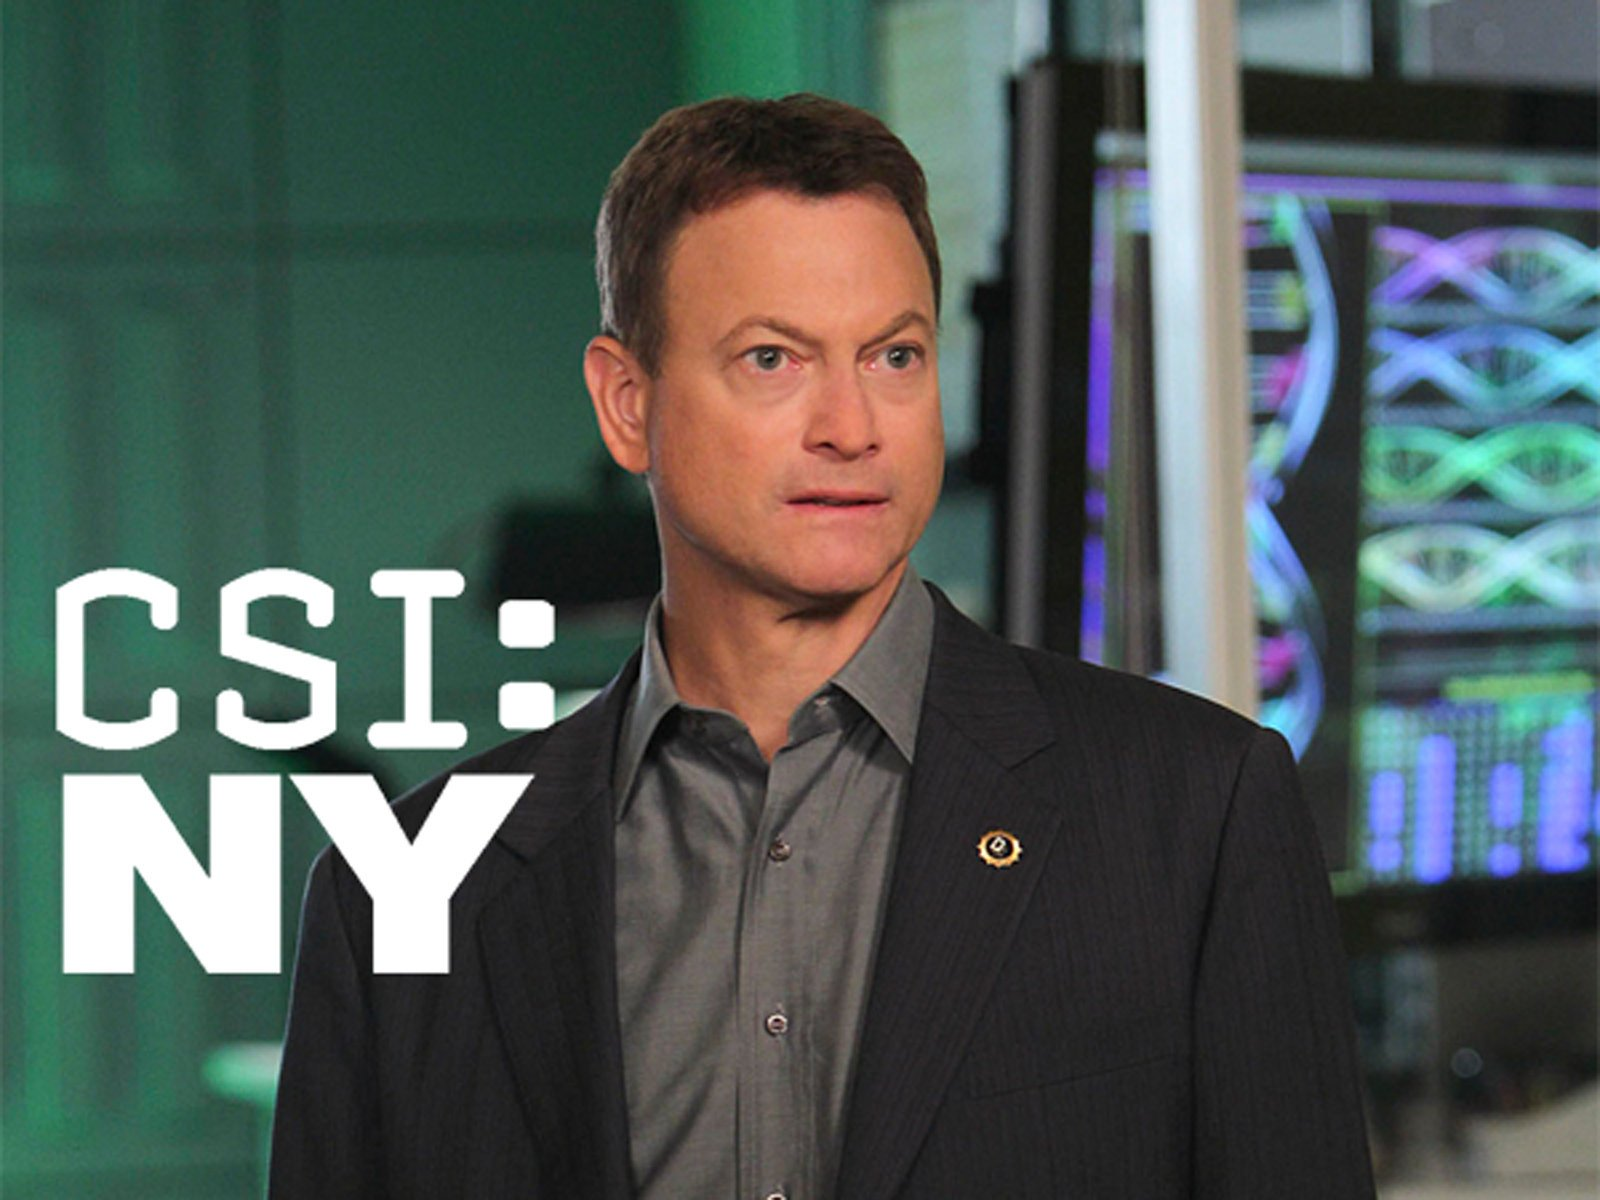 csi ny season 9 episode 3 watch online